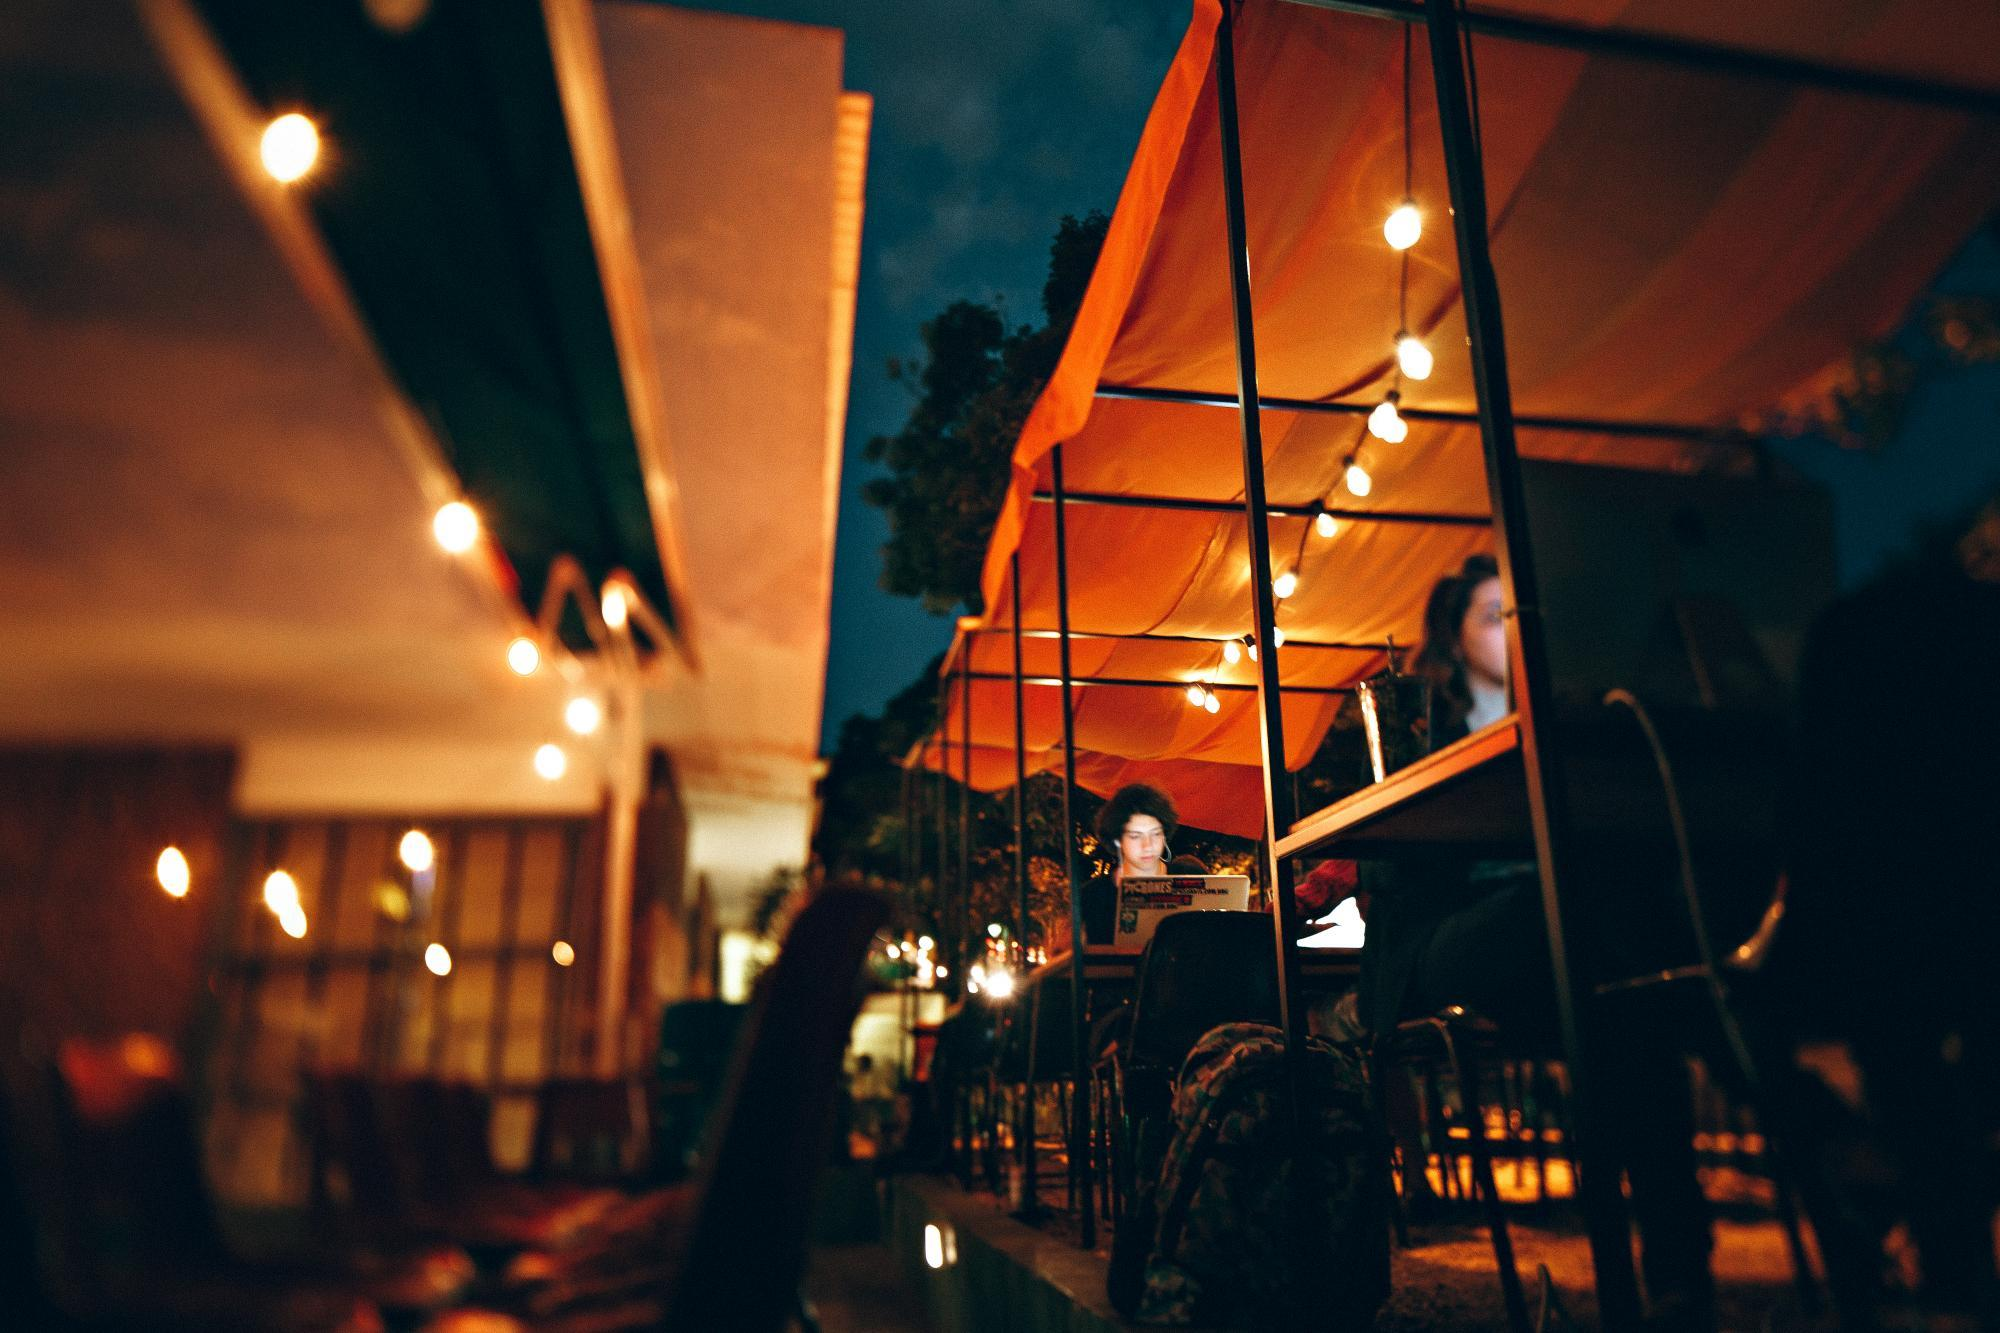 10 best chattanooga restaurants with